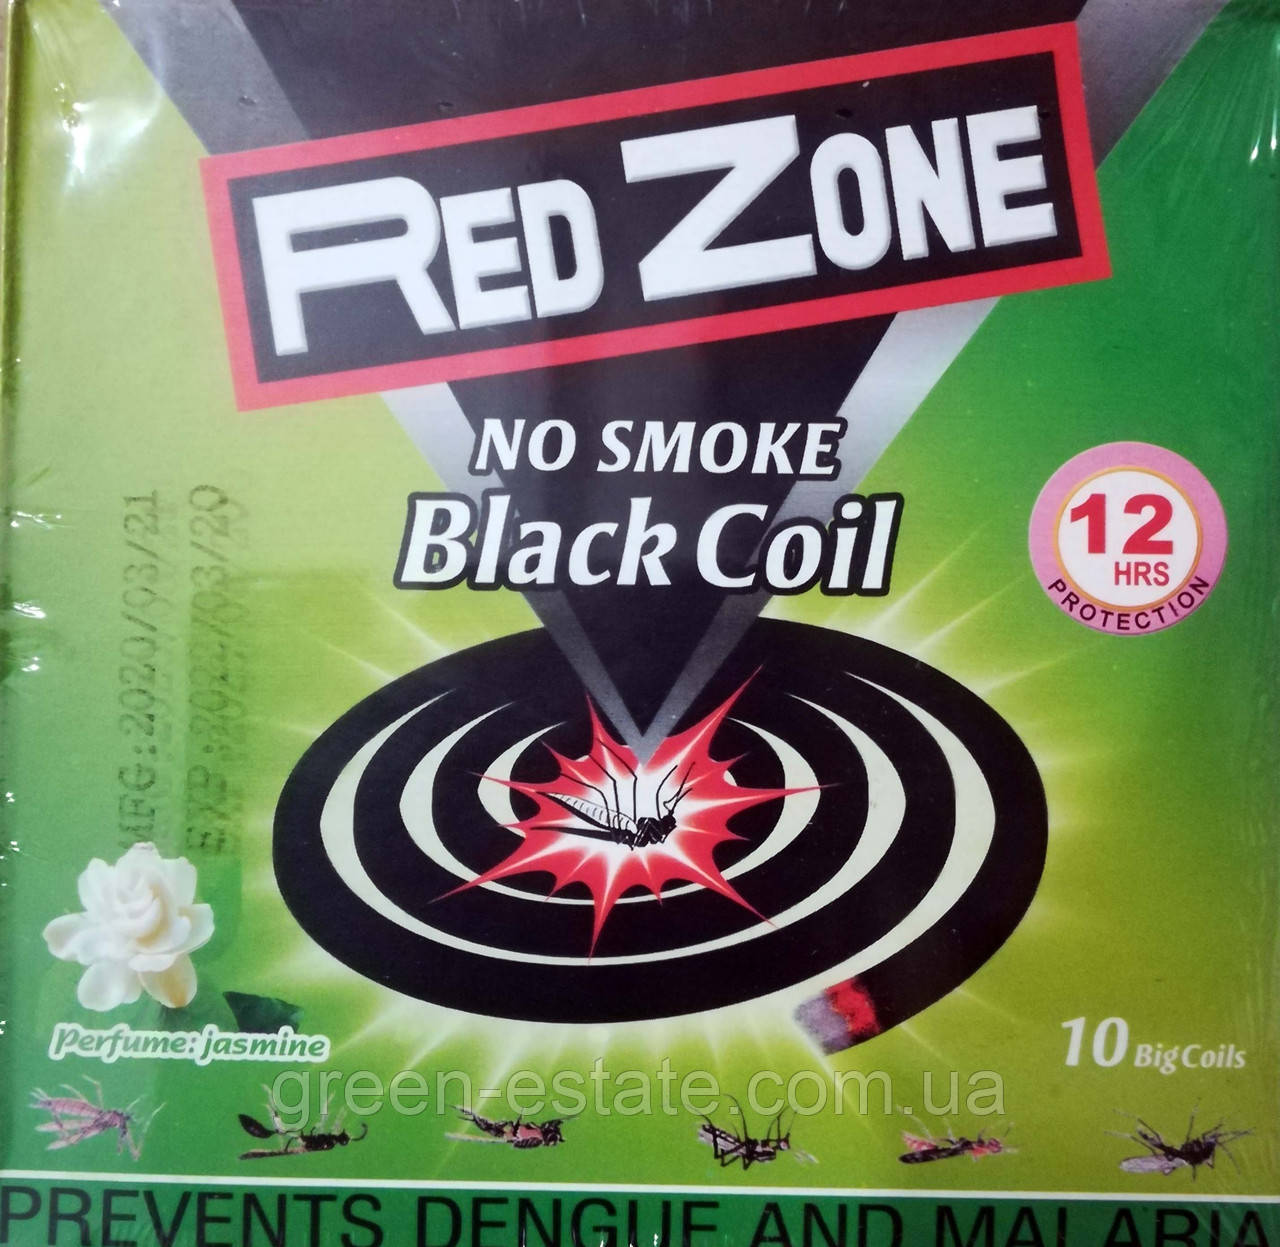 Спирали от комаров Red Zone без дыма 10 шт.